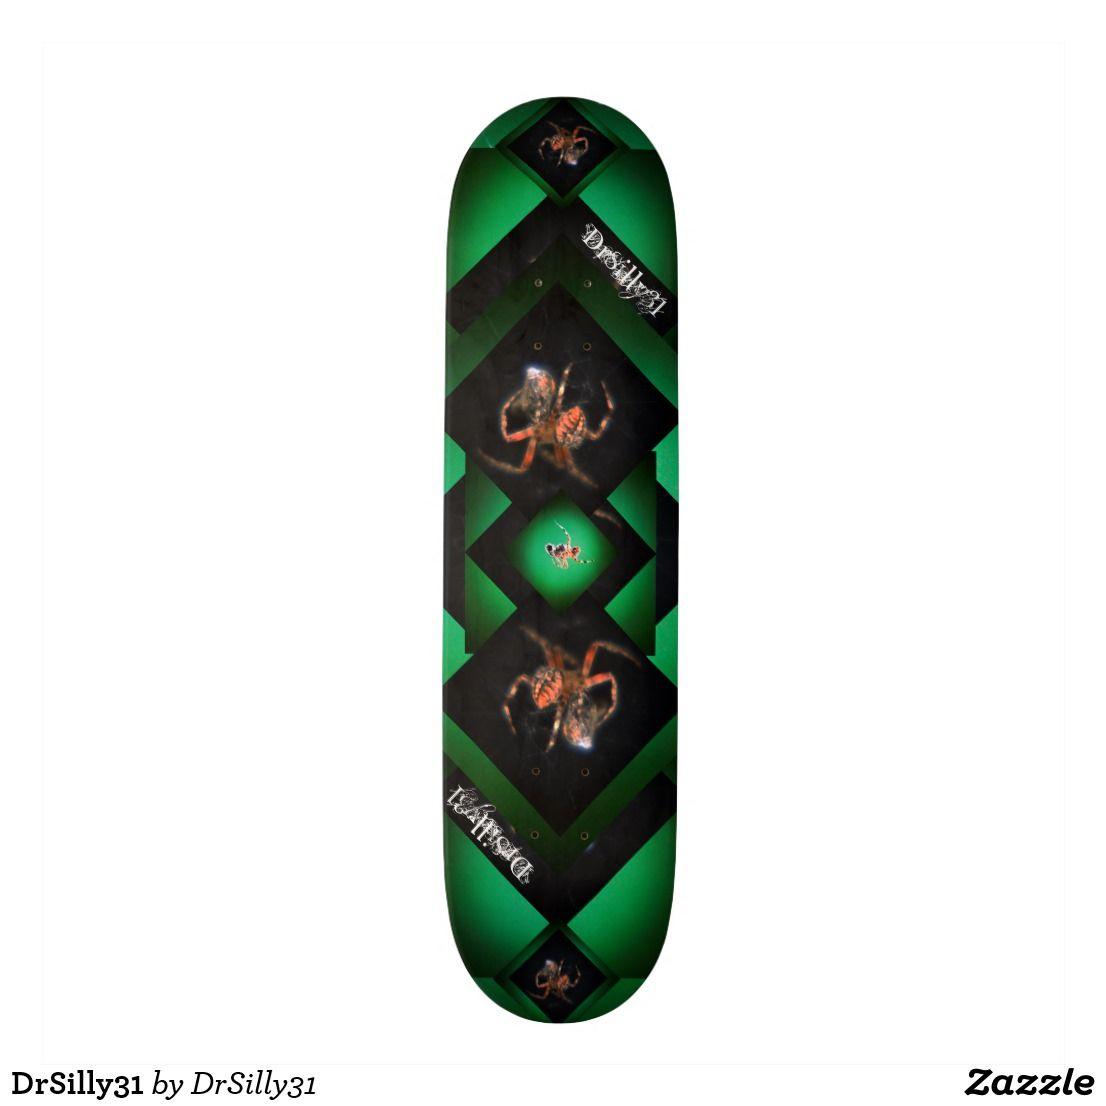 Drsilly31 skateboard deck skateboard decks